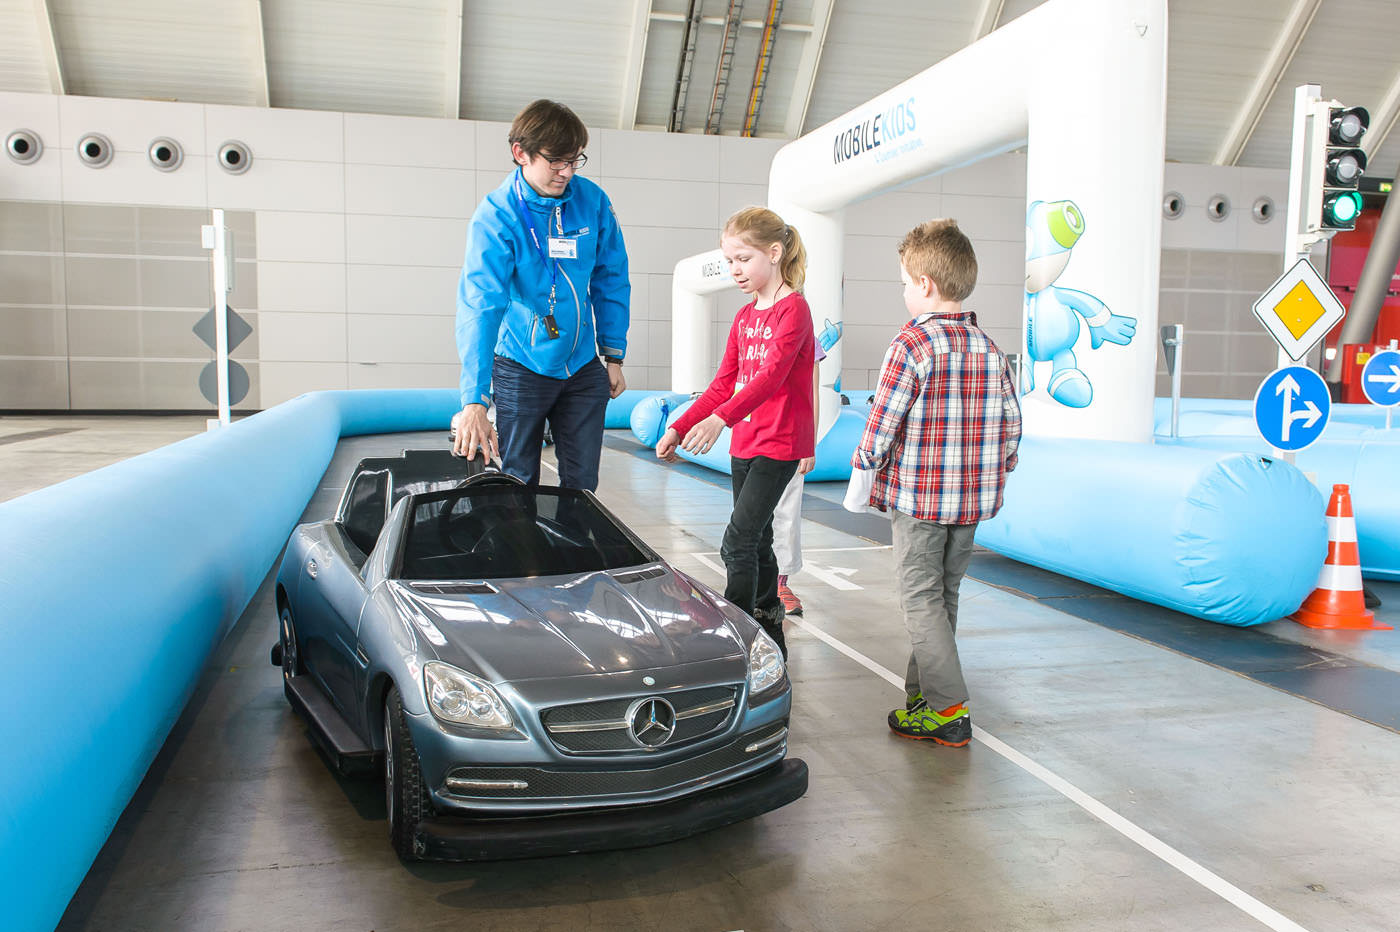 Event, Mobile Kinderverkehrsschule, MobileKids, Daimler, Merces-Benz,Elektroauto, SLK, Parcours, Agentur Ravensburger